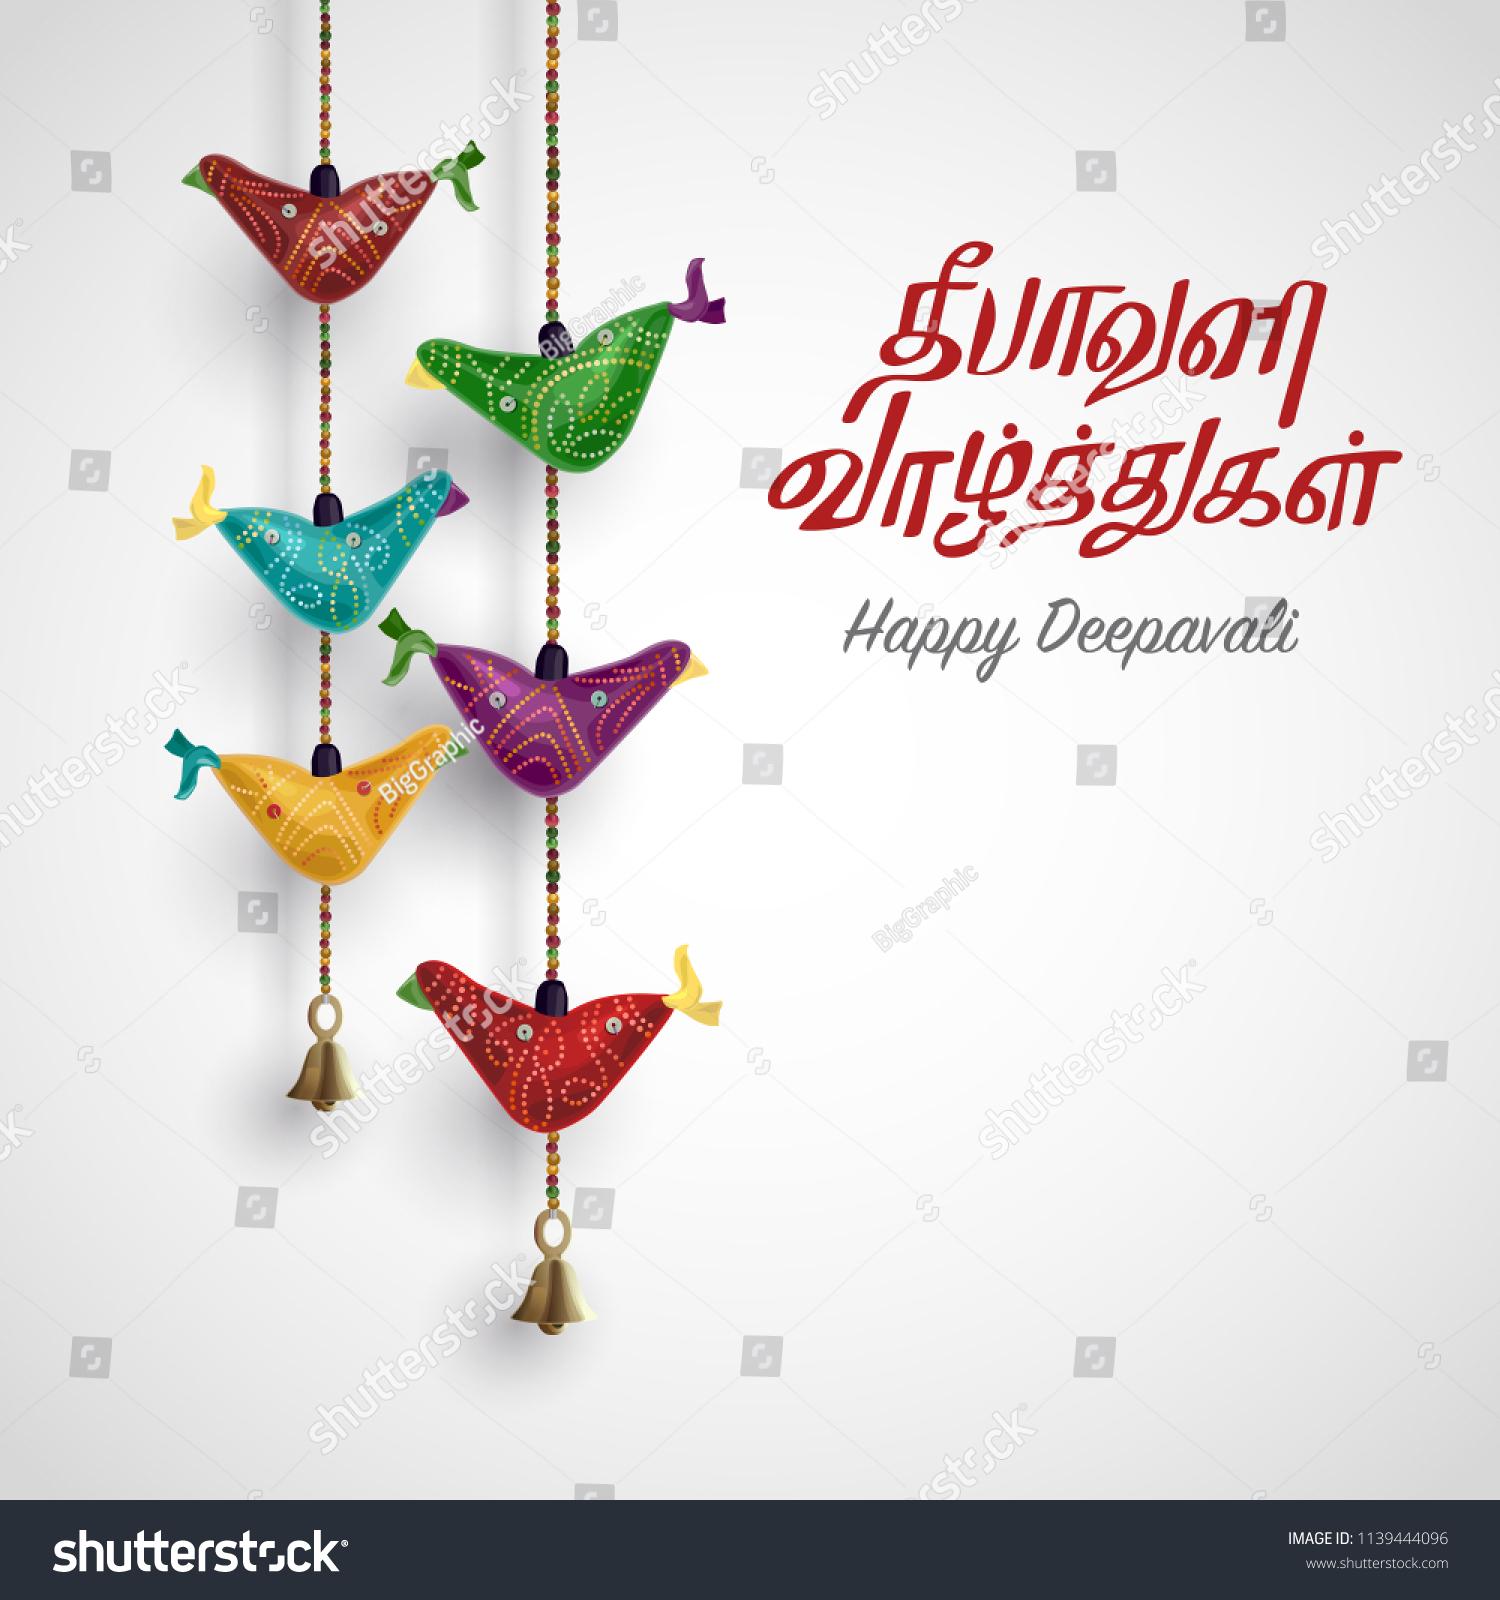 Deepavali Greetings Background Tamil Character Deepavali Stock